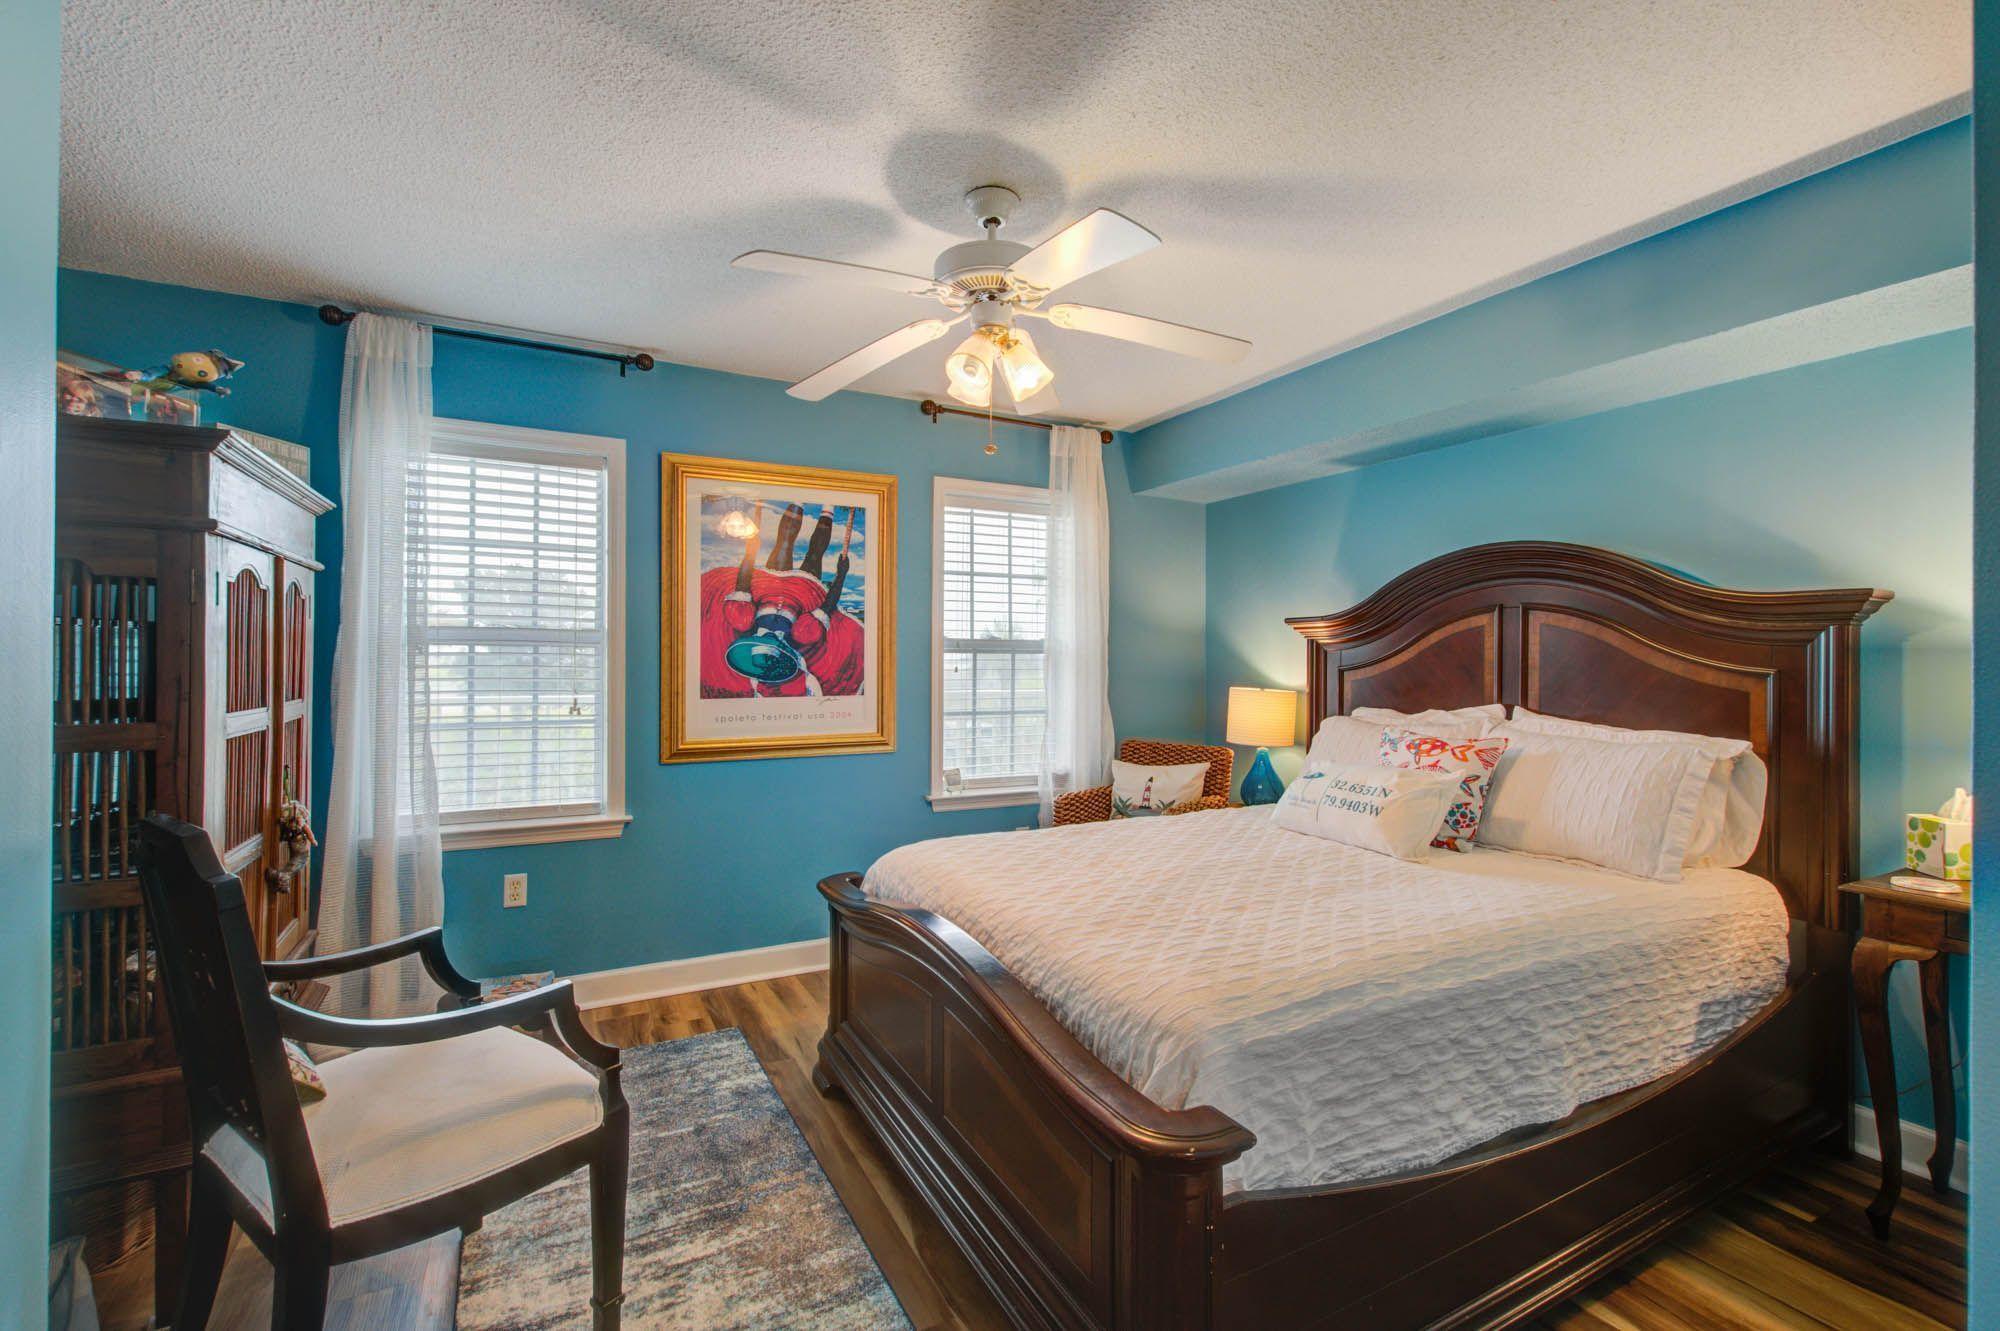 Turn of River Homes For Sale - 2395 Folly, Folly Beach, SC - 14